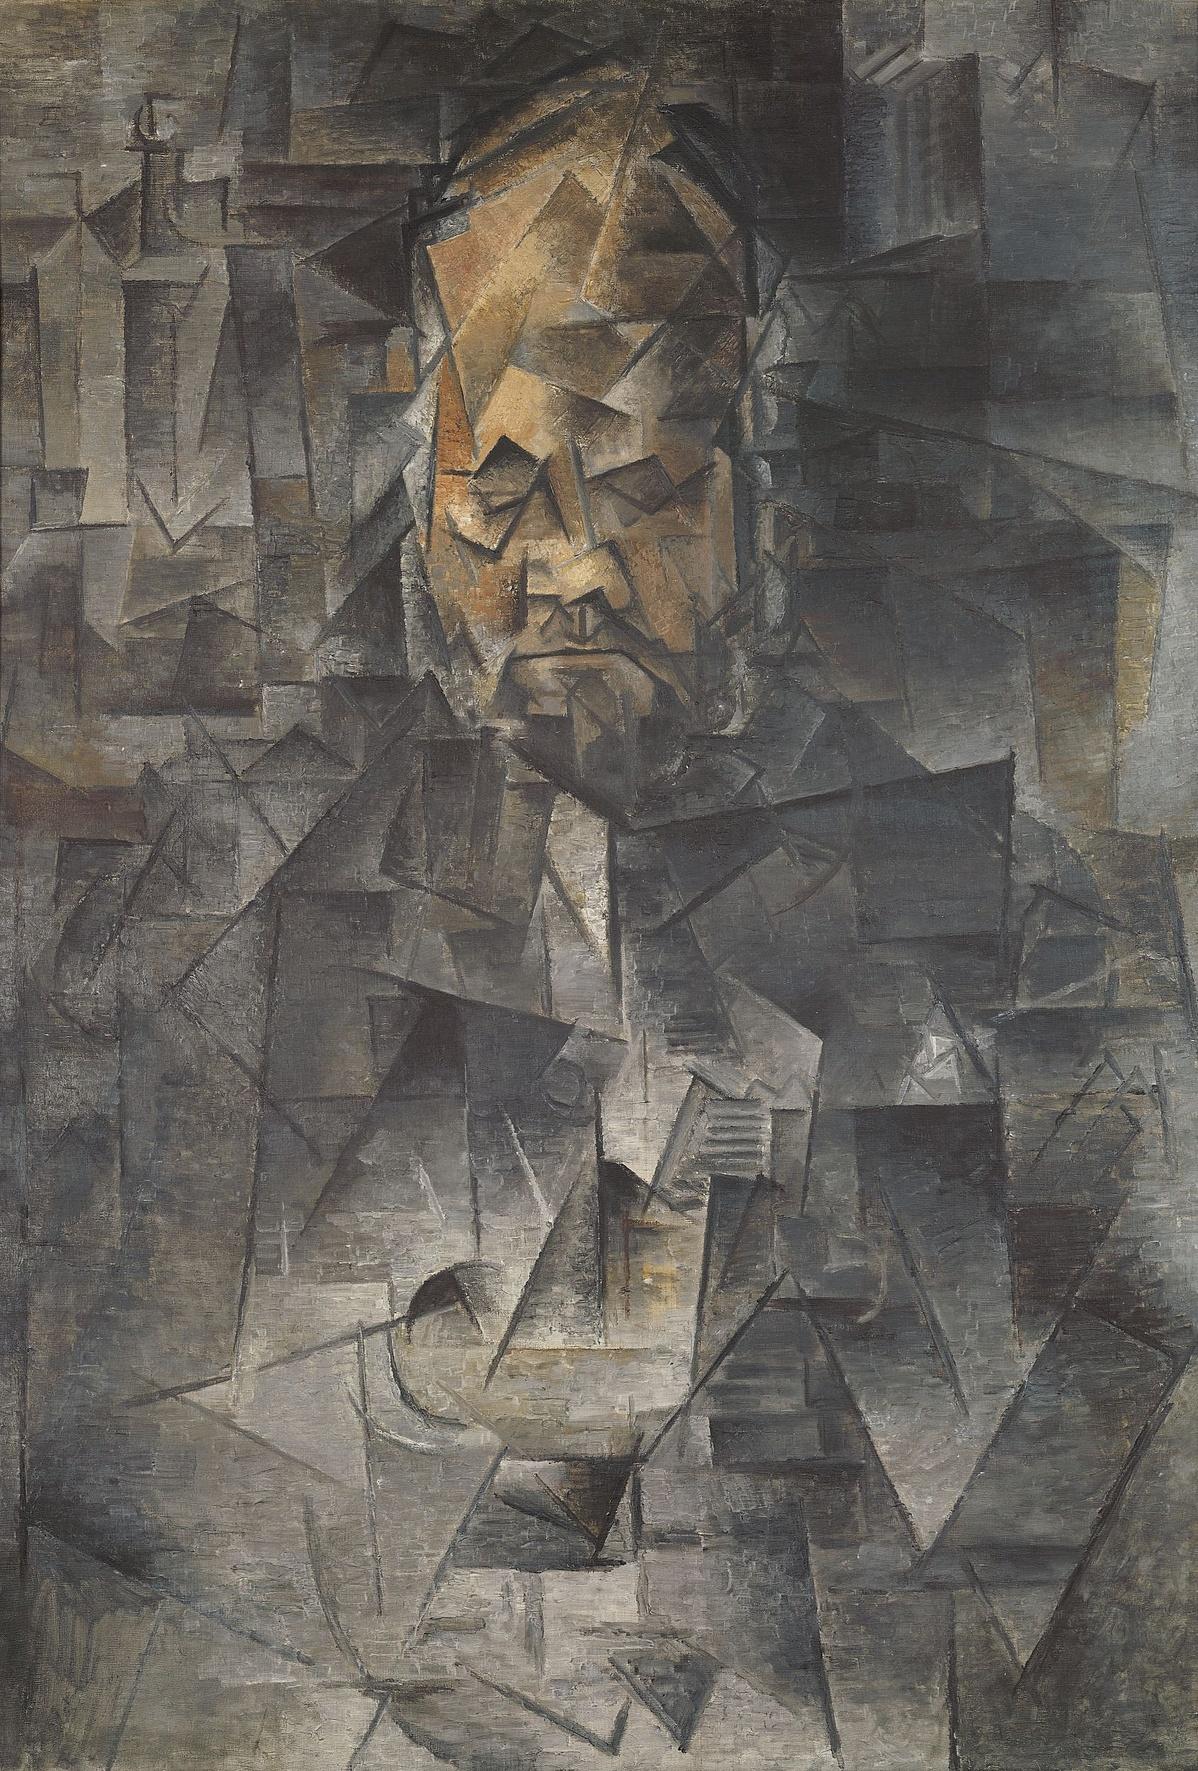 Pablo Picasso: Ambroise Vollard portréja, 1909-1910